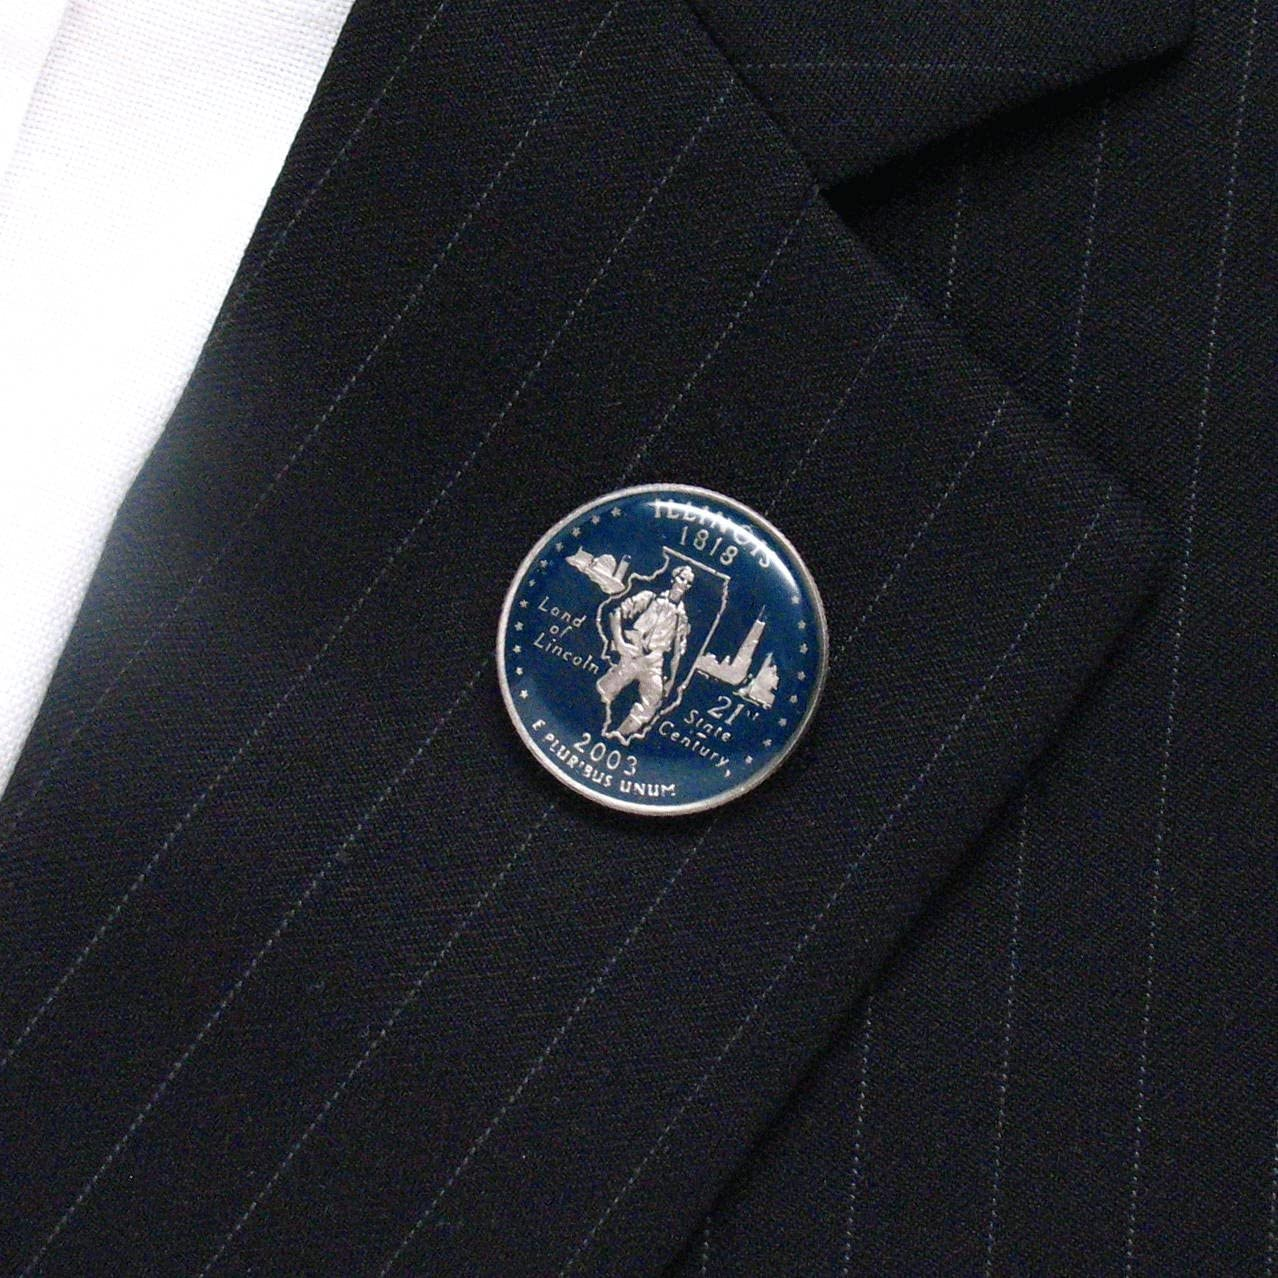 Illinois trimestre Tie Tack Pin de solapa traje bandera Estado ...